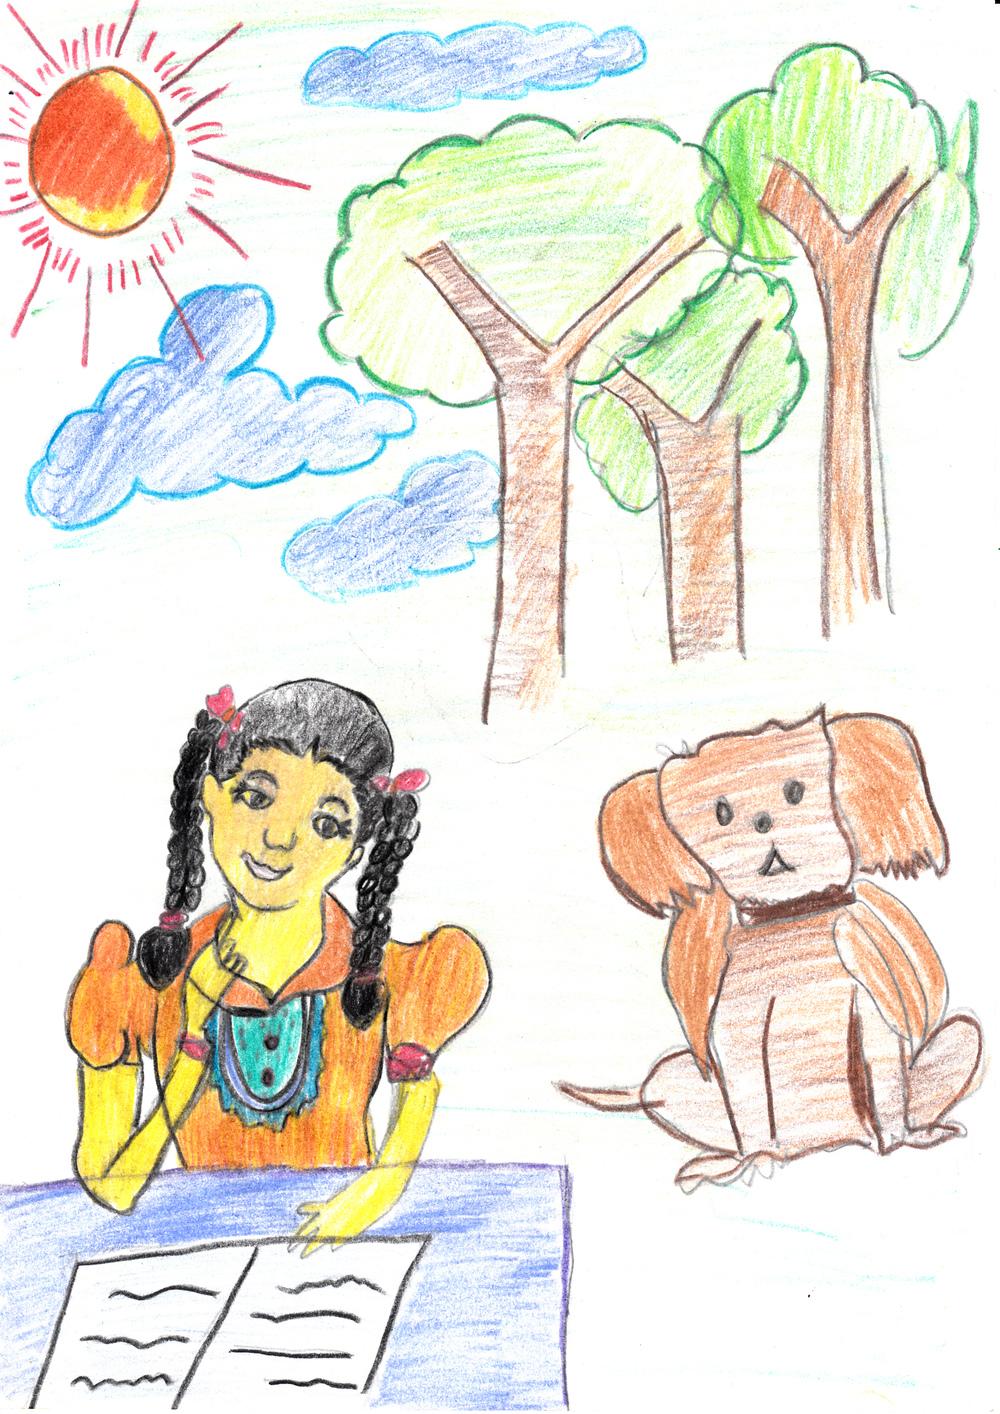 Students art work from Bolawalana Orphanage 3_0036.jpg